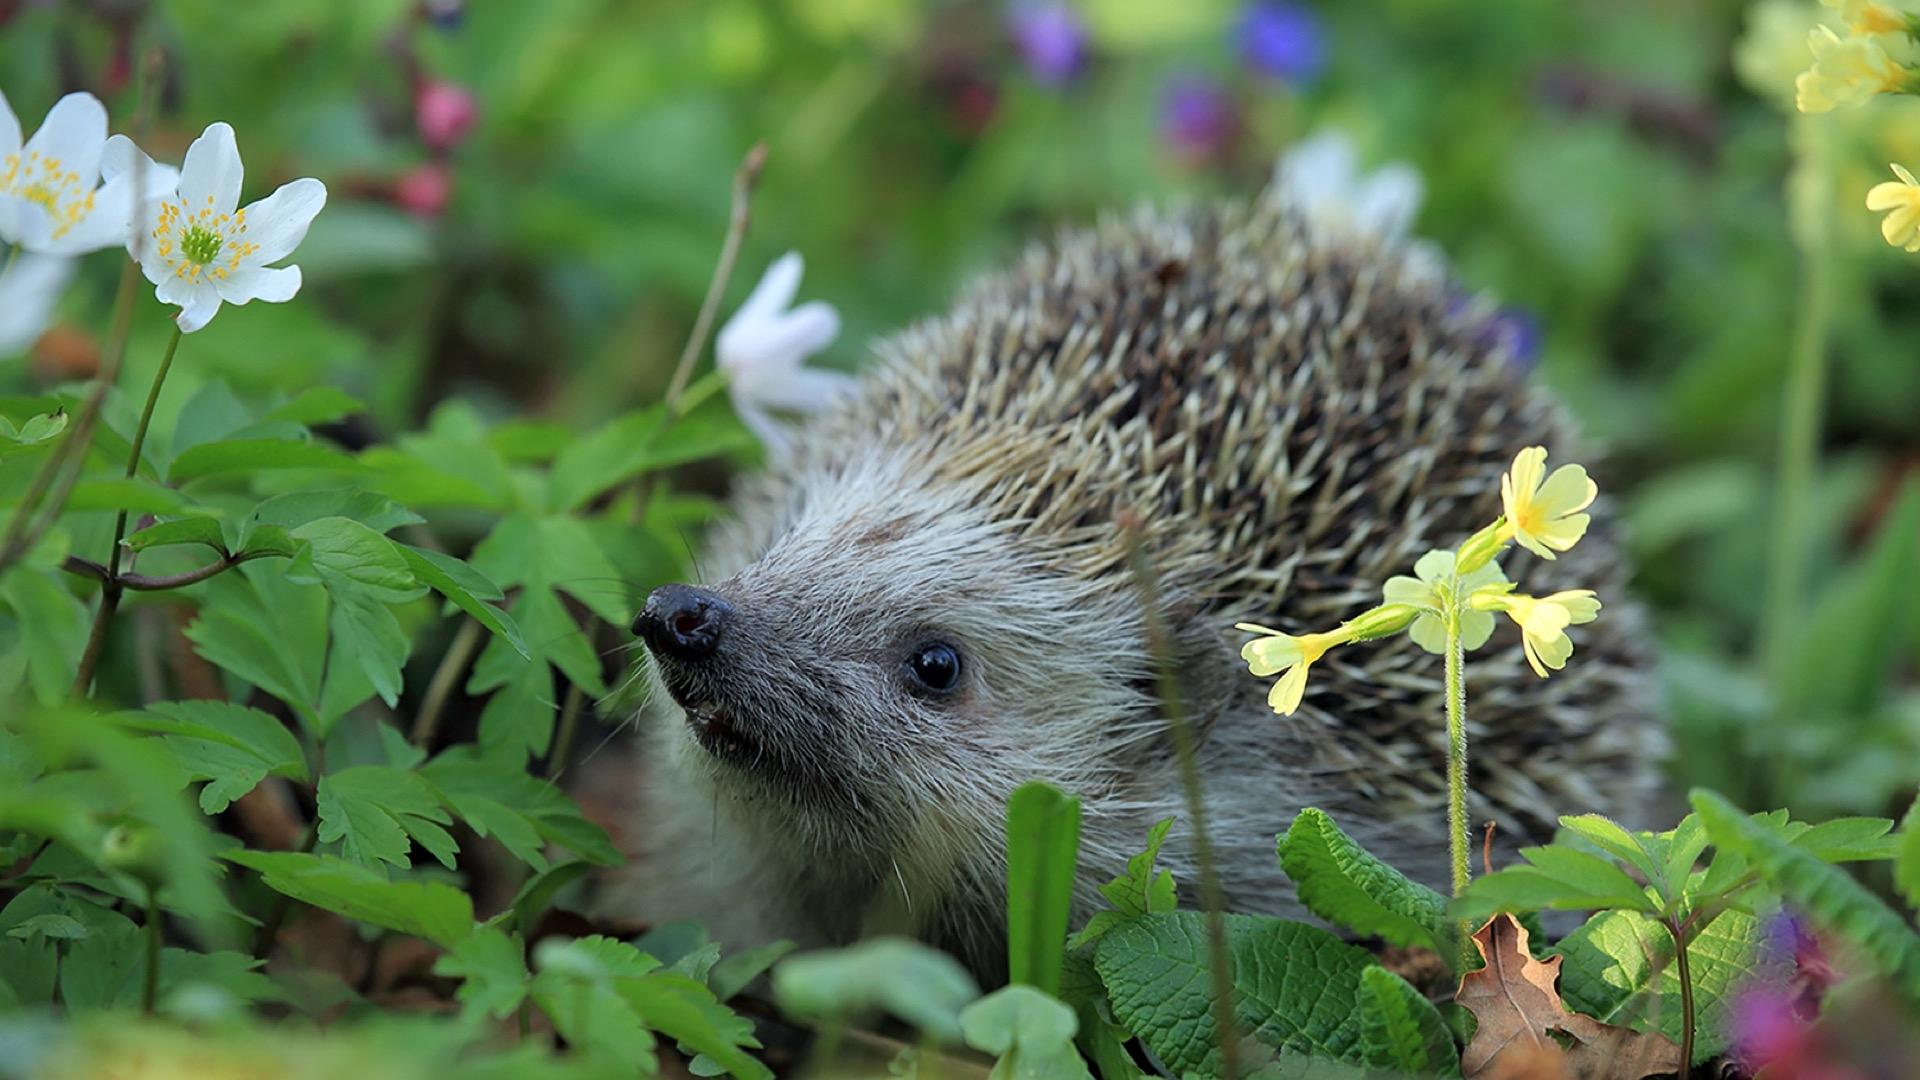 hedgehog among flowers